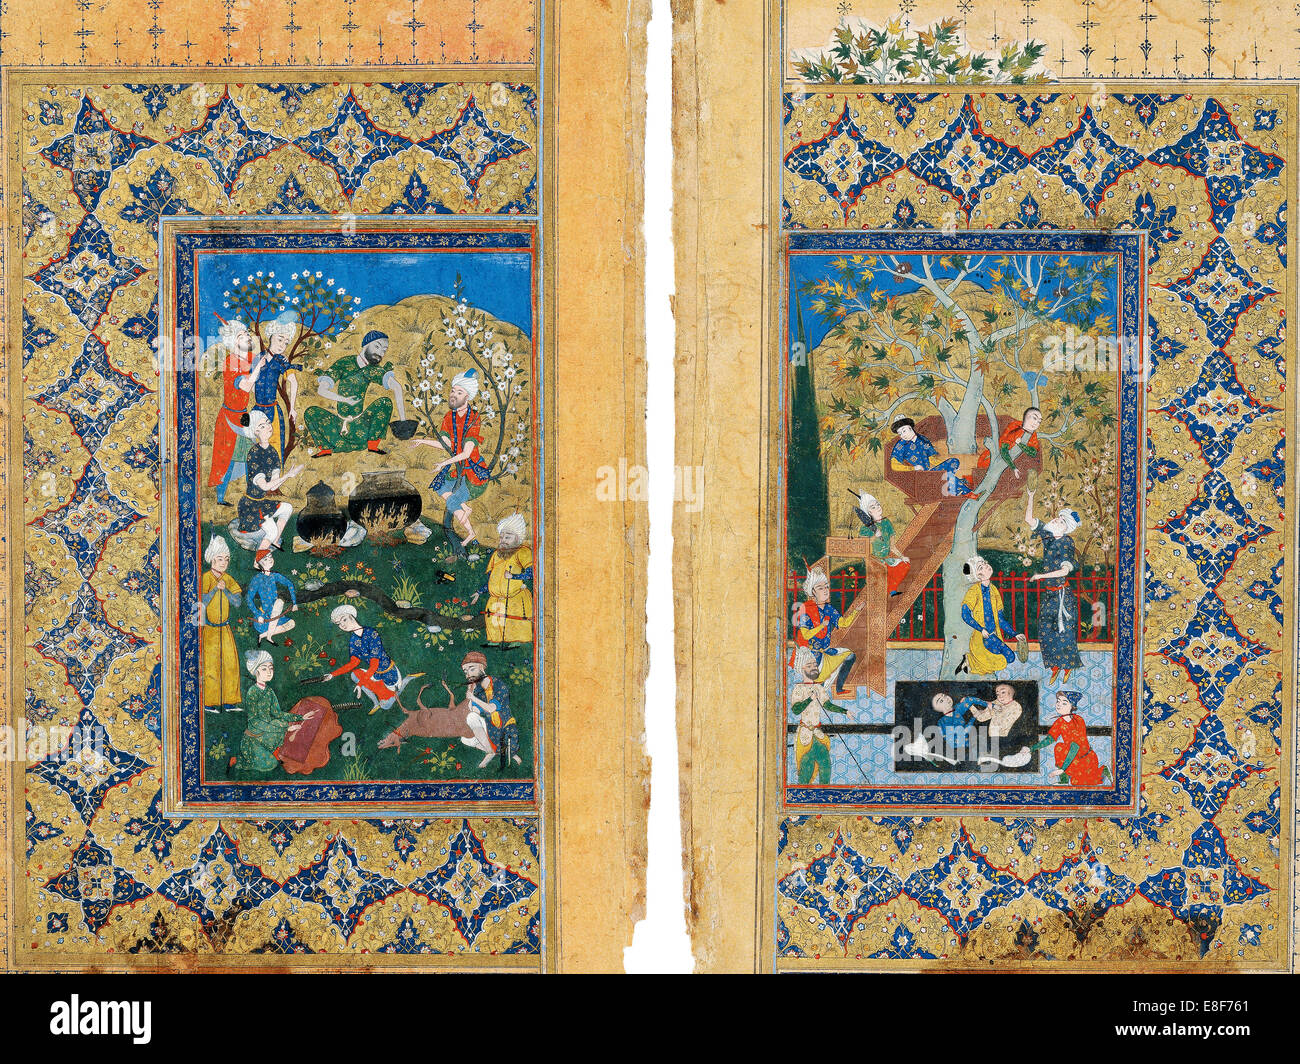 Picnic. Miniature from Yusuf and Zalikha (Legend of Joseph and Potiphar's Wife) by Jami. Artist: Iranian master - Stock Image